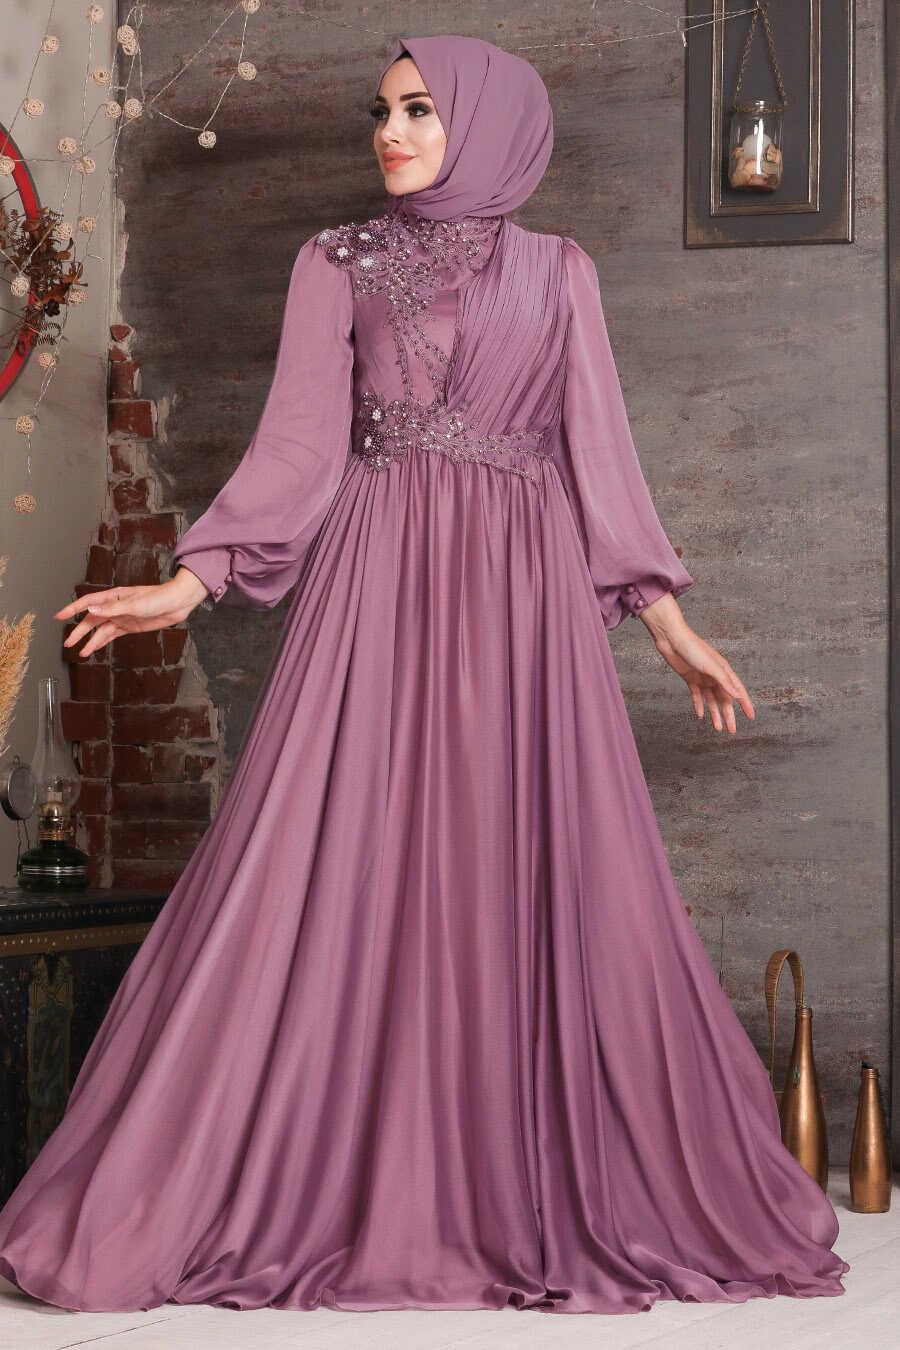 Dusty Rose Hijab Evening Dress 21650GK